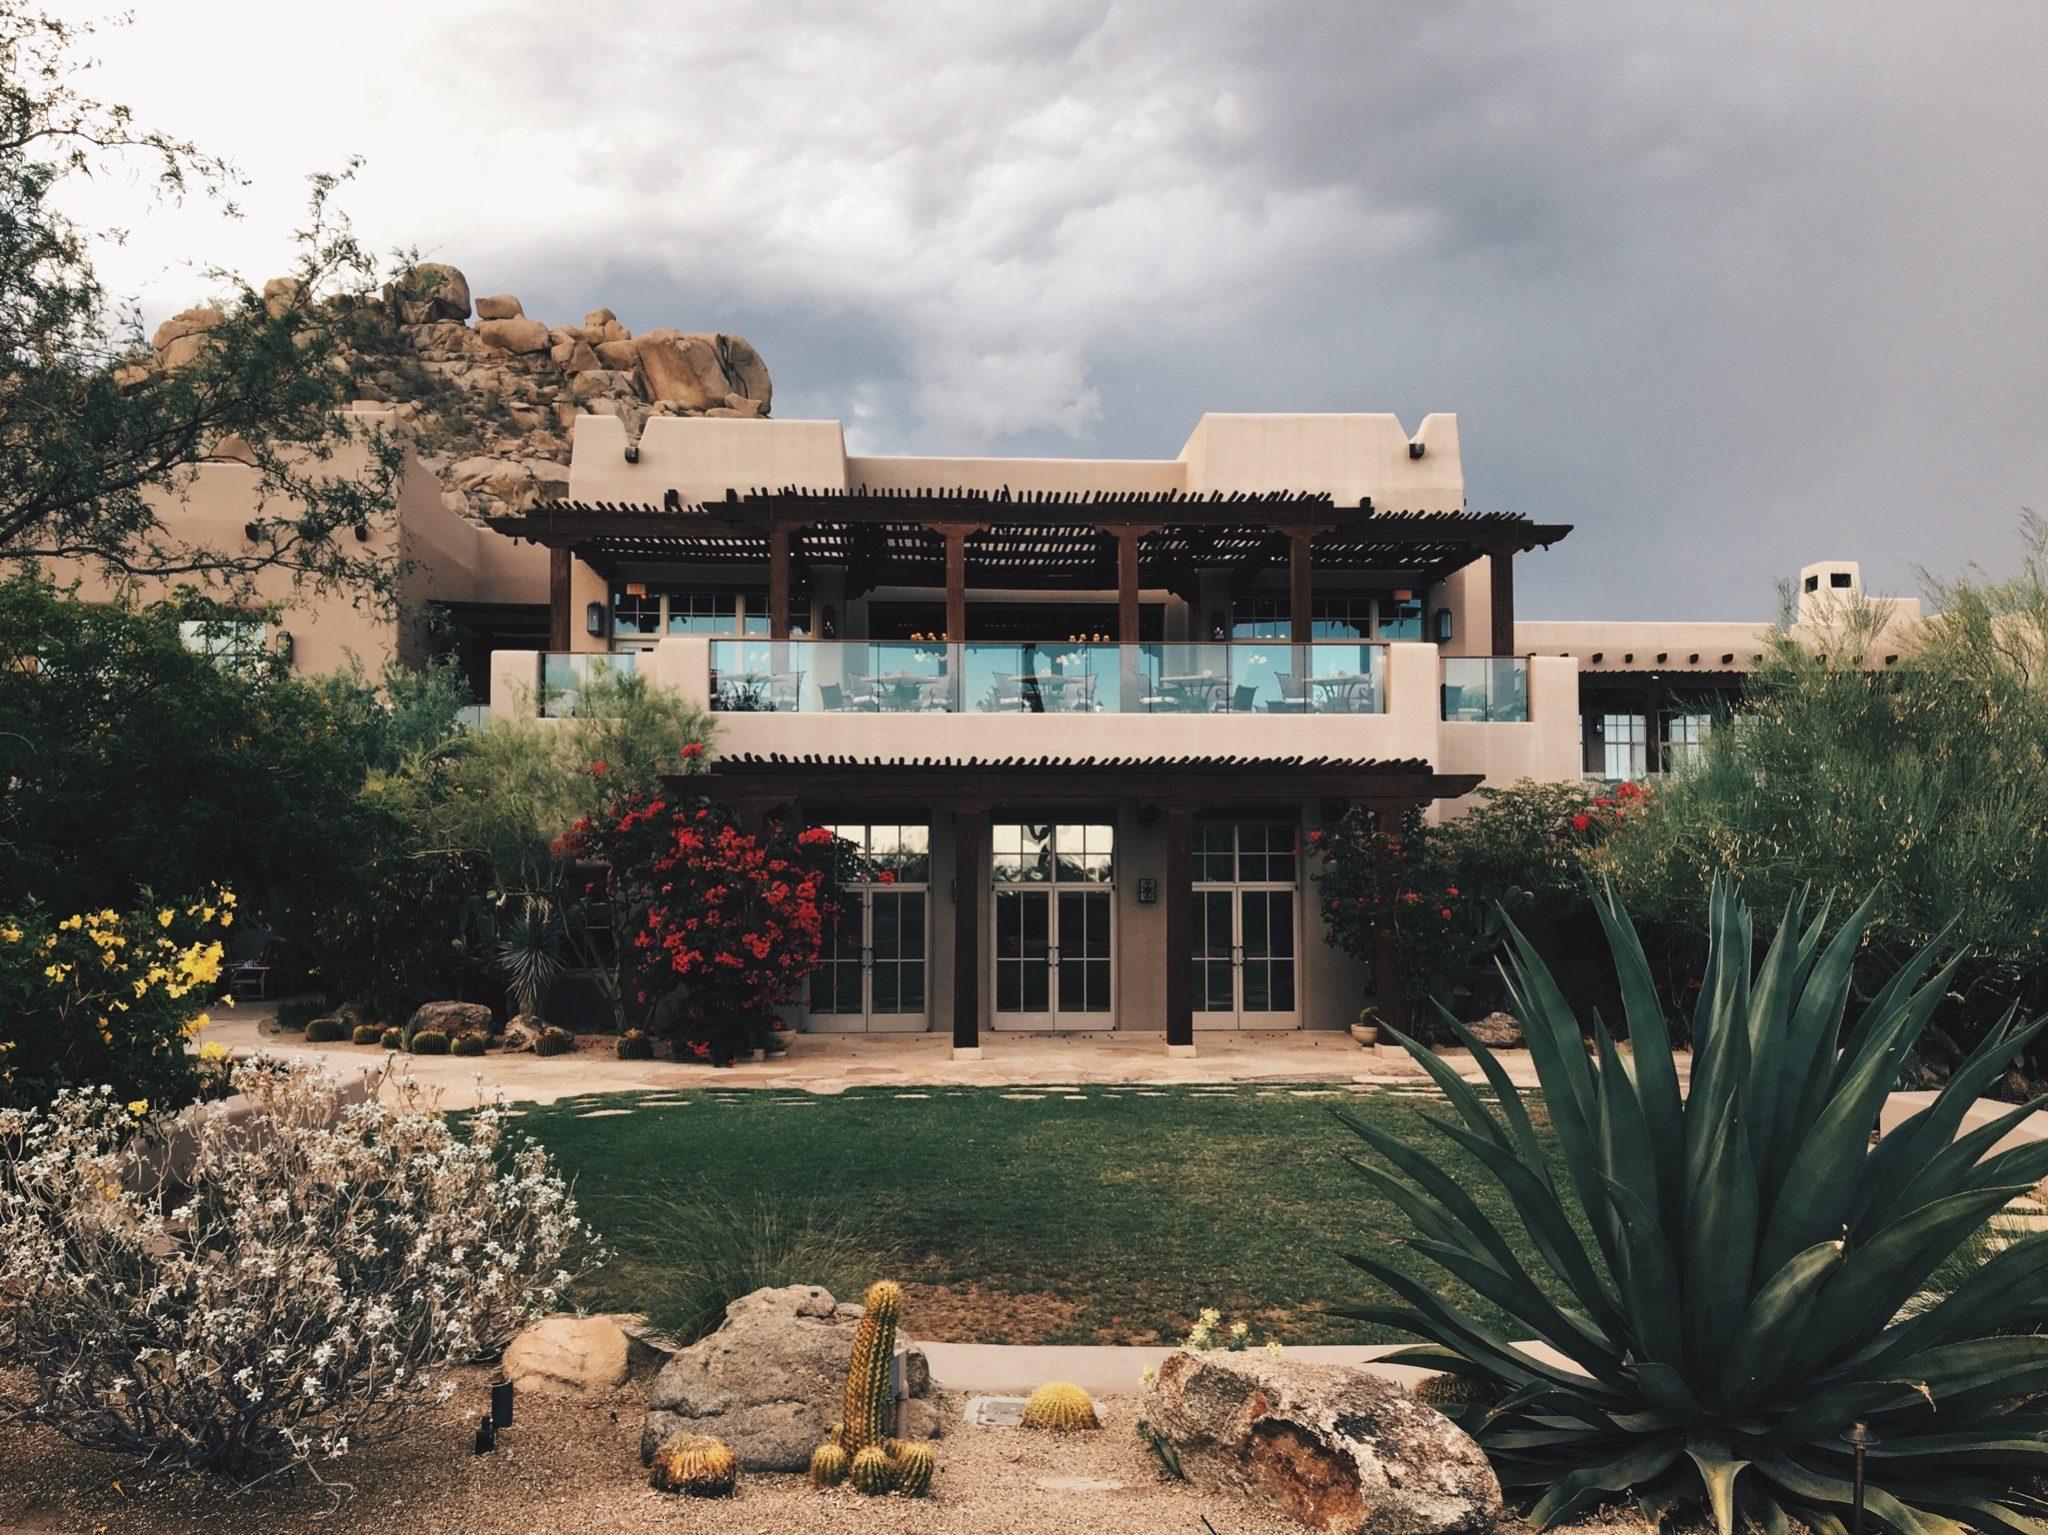 Scottsdale Minimoon | Scottsdale, AZ travel | where to stay in Scottsdale, AZ | Scottsdale, AZ travel guide | hotels in Scottsdale, AZ || Dressed to Kill